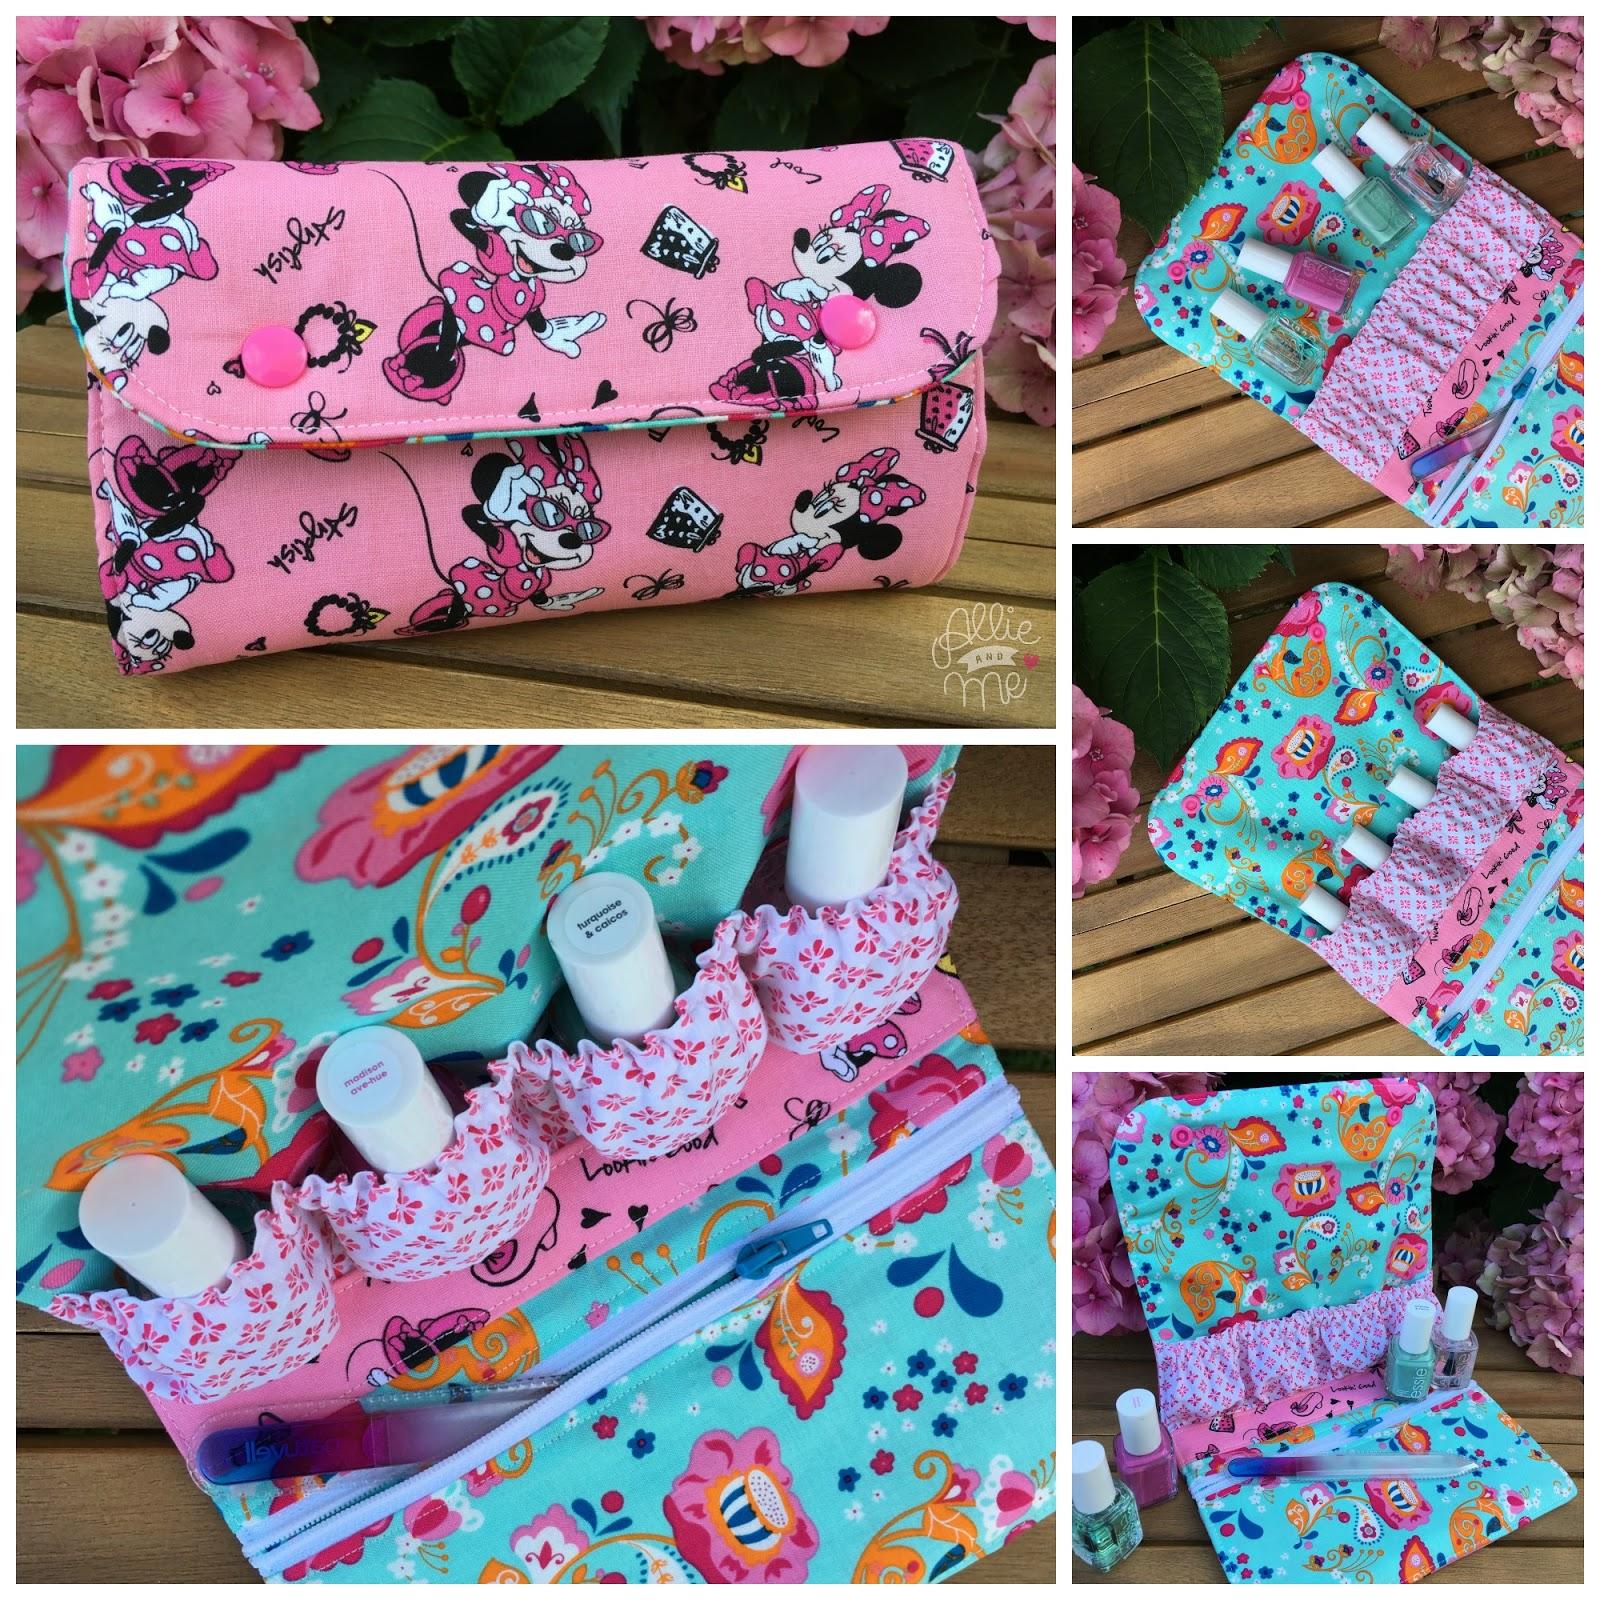 Snappy Manicure Pouch ☆ FreeBook ☆ Ich packe meinen Koffer …